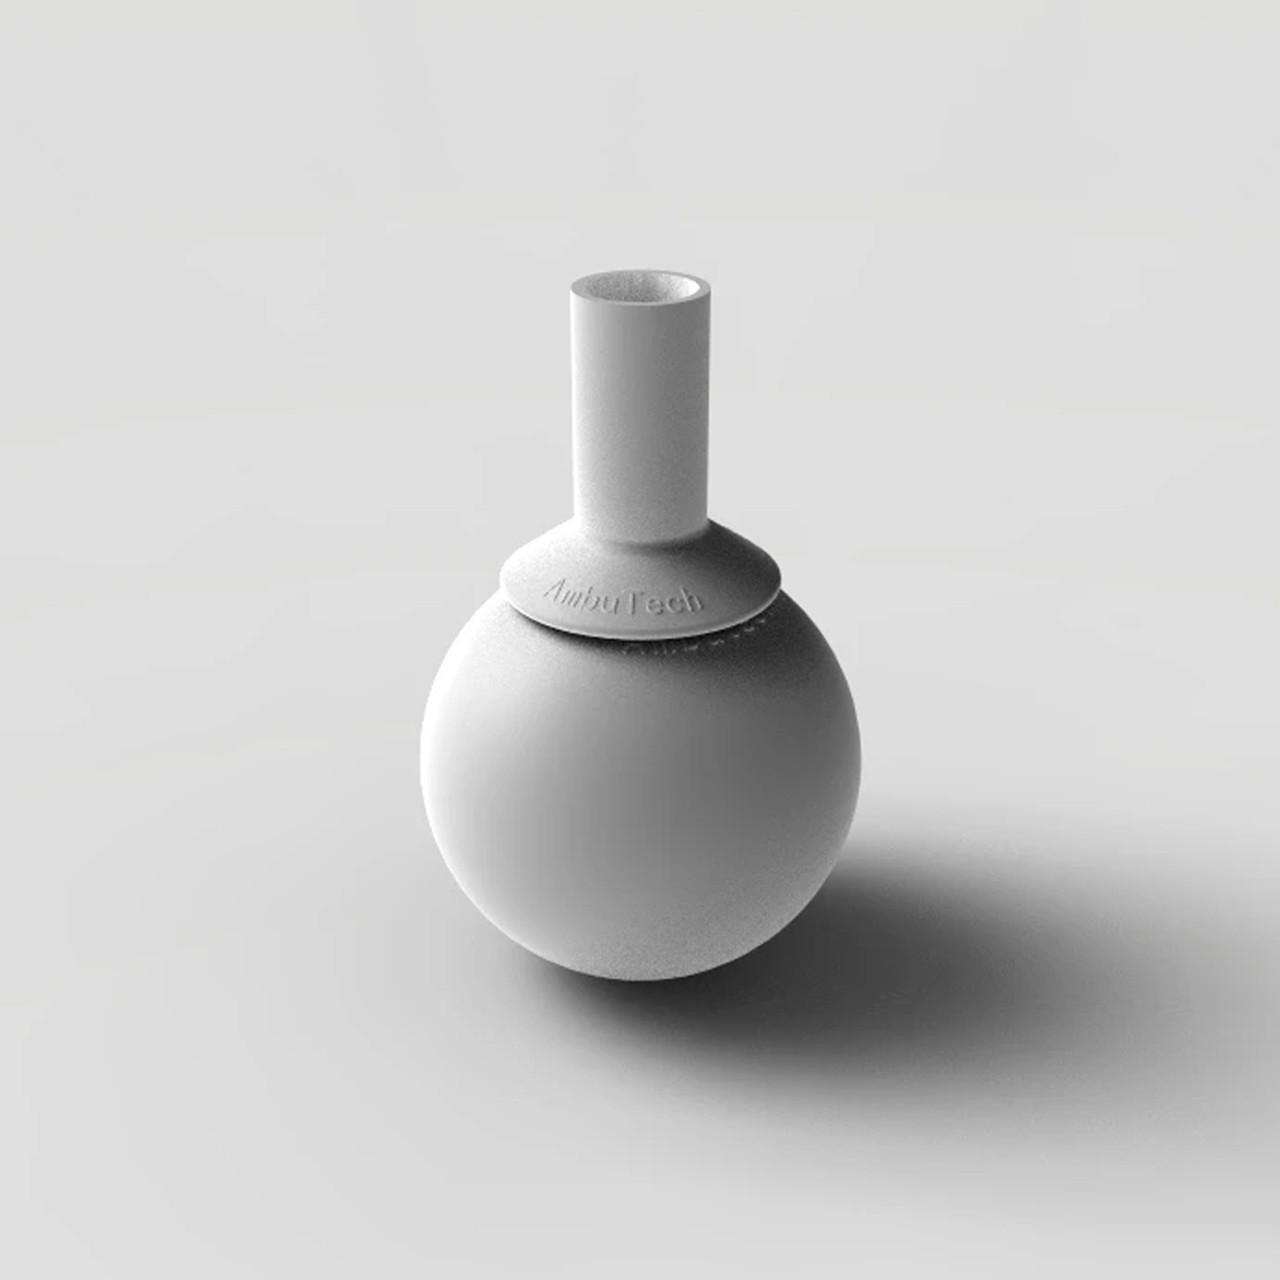 Ambutech Slip On Rolling Ball Tip - White